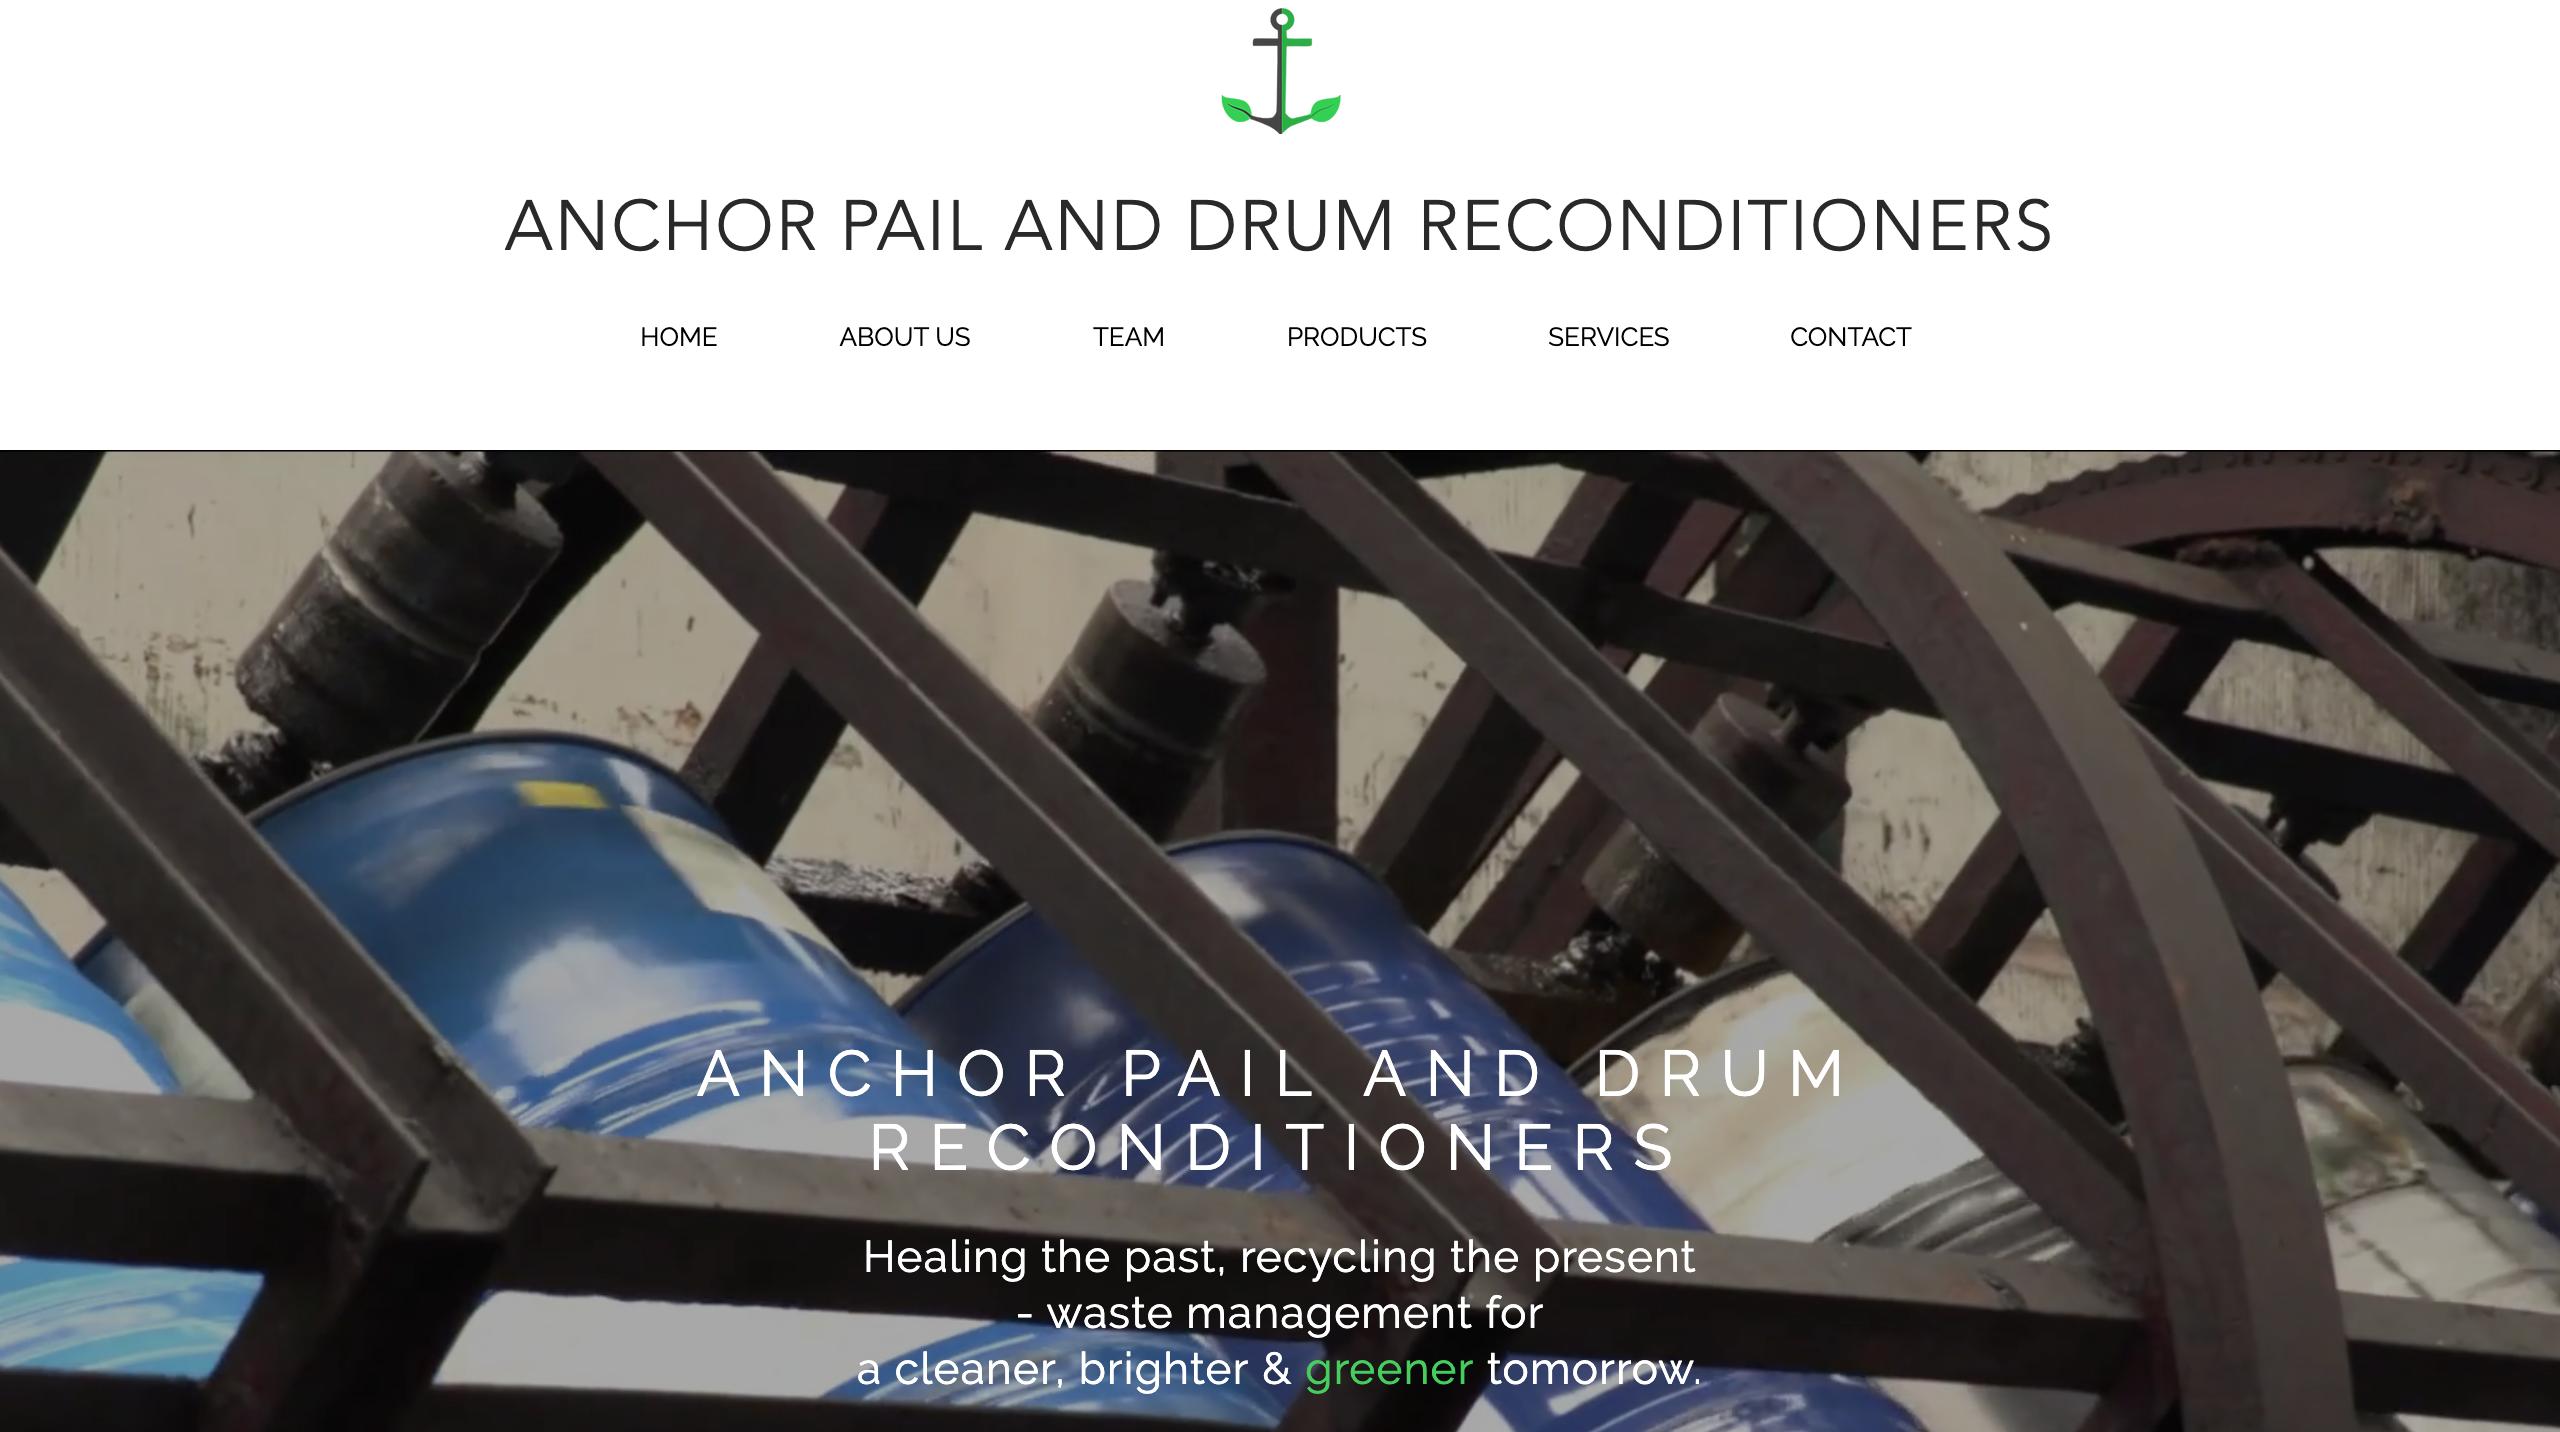 Anchor Pail & Drum